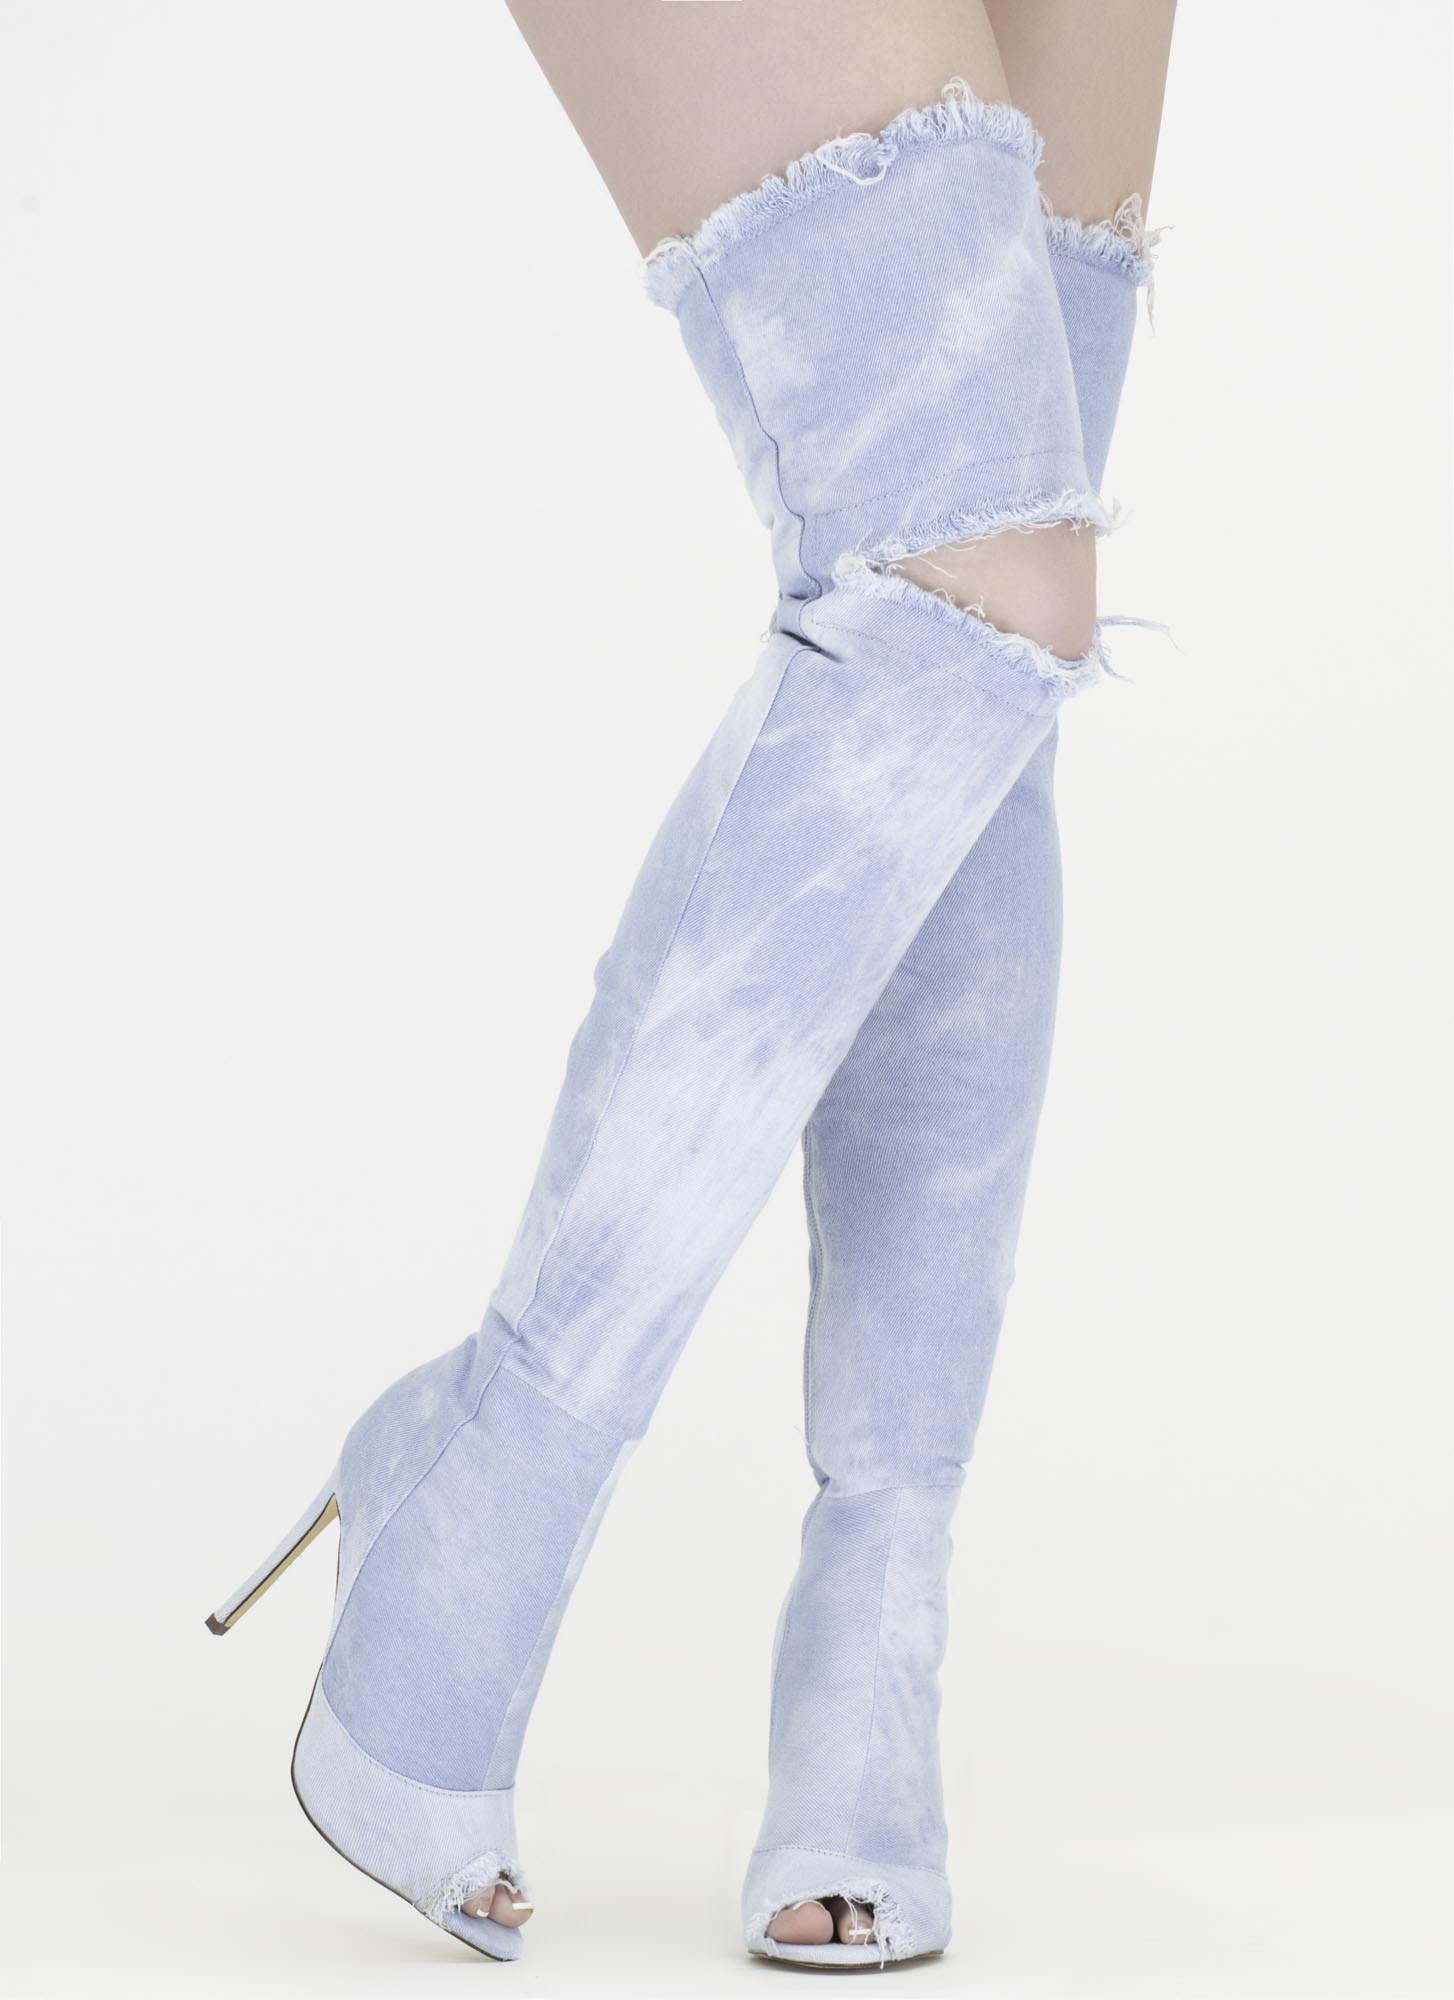 Distress Signal Denim Thigh-High Boots BLUE LTBLUE GREY MEDIUMBLUE BLACK - GoJane.com